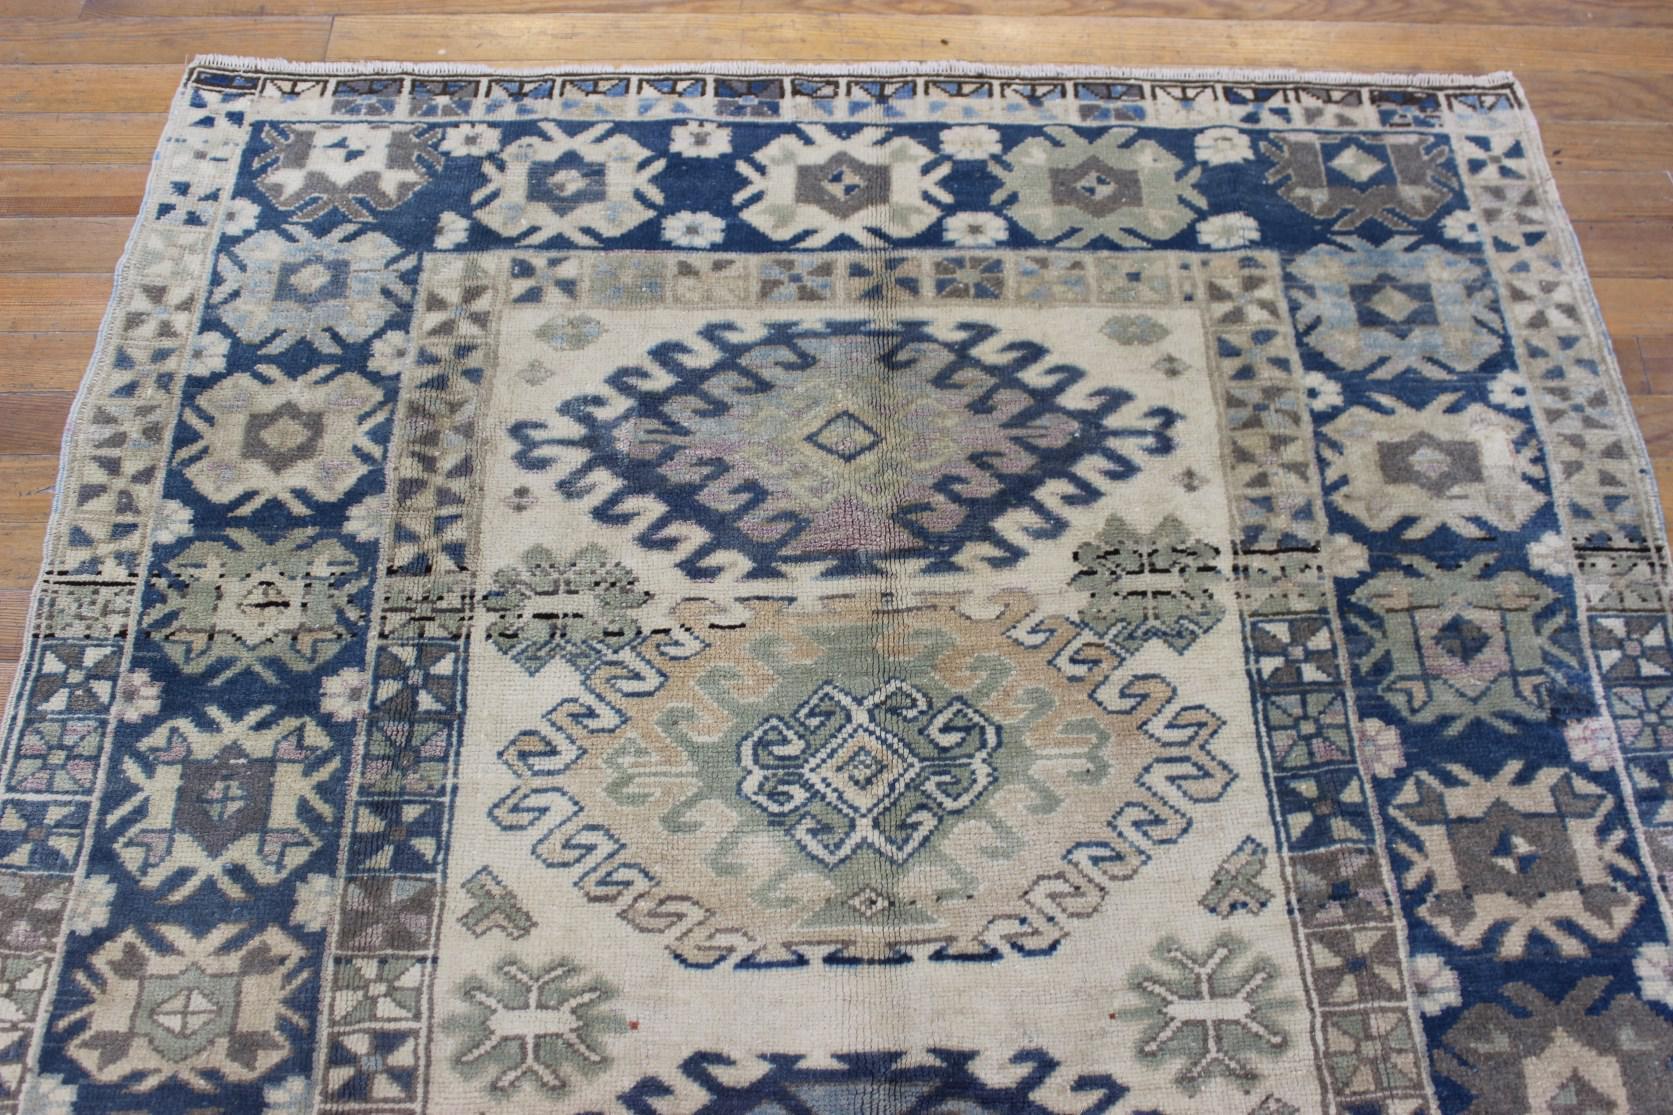 Oriental Turkish Yayla Rug - 4.3' x 6.4' | Chairish